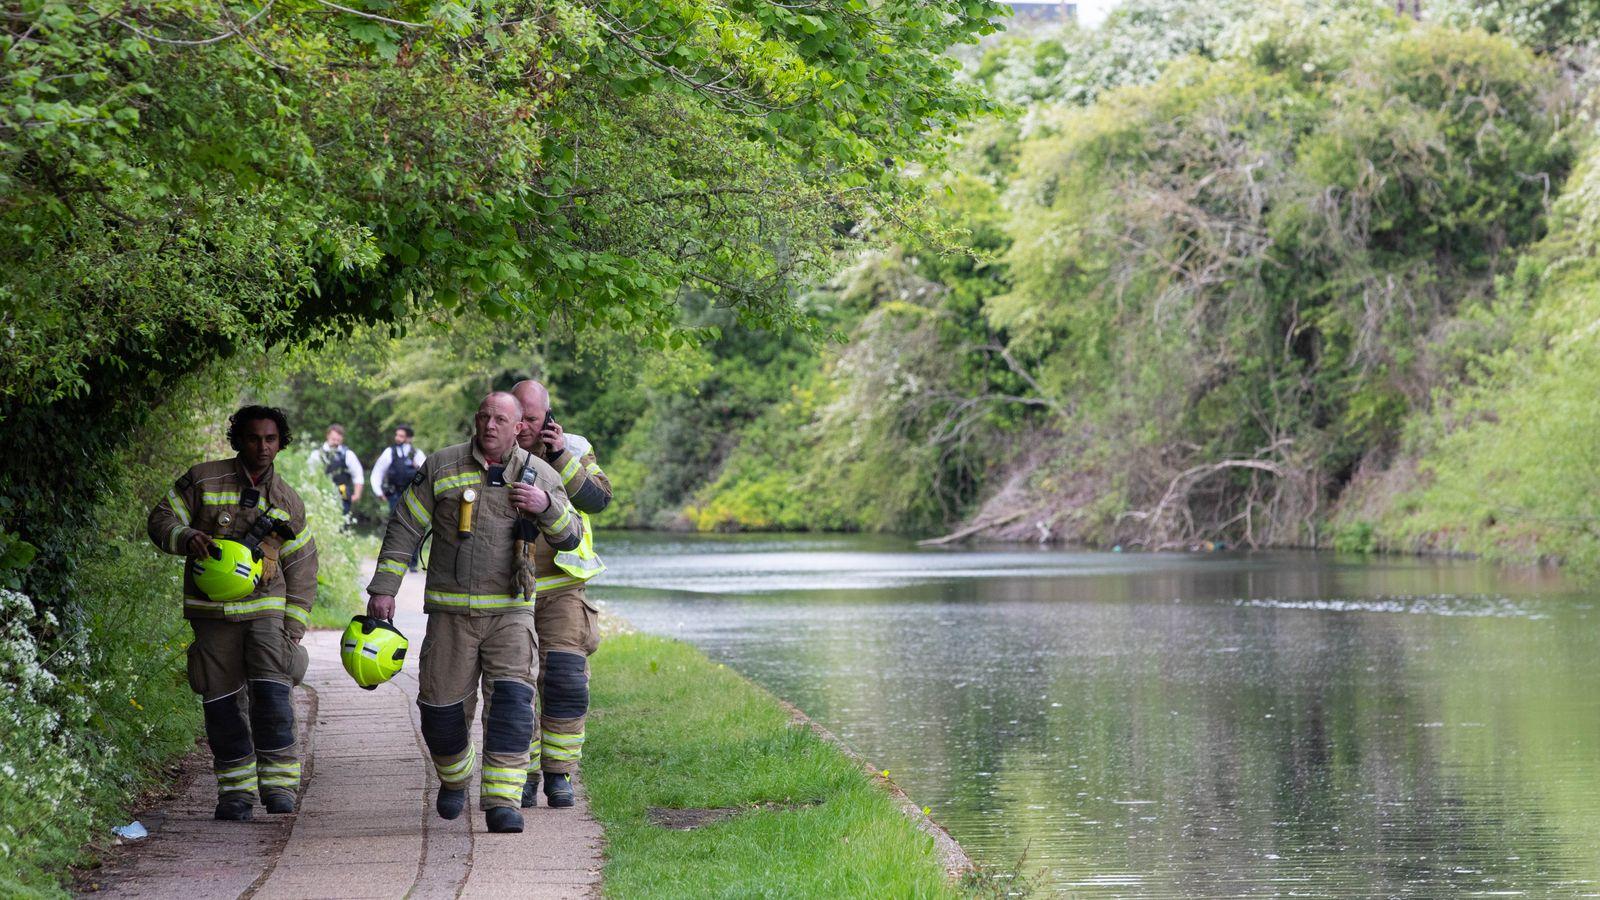 Newborn baby found dead in London canal